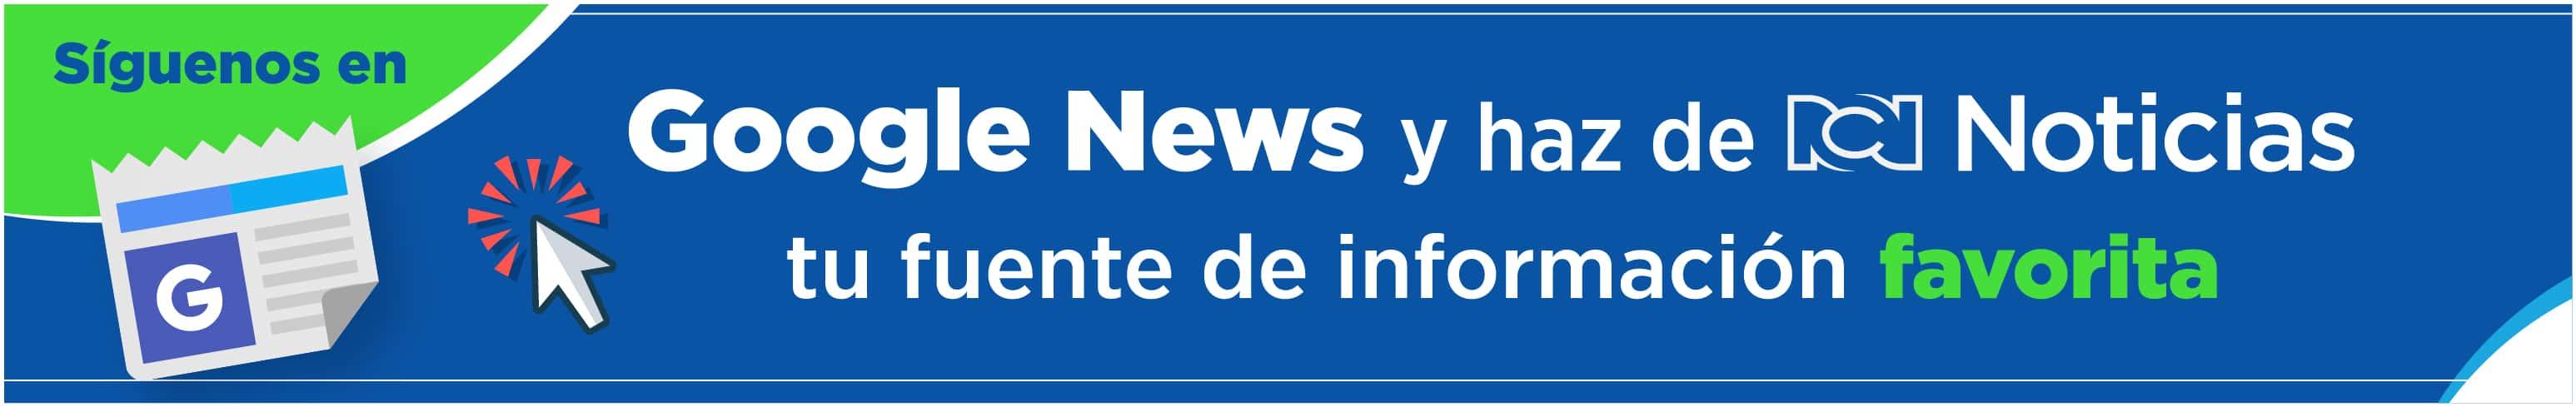 Noticias RCN Google News